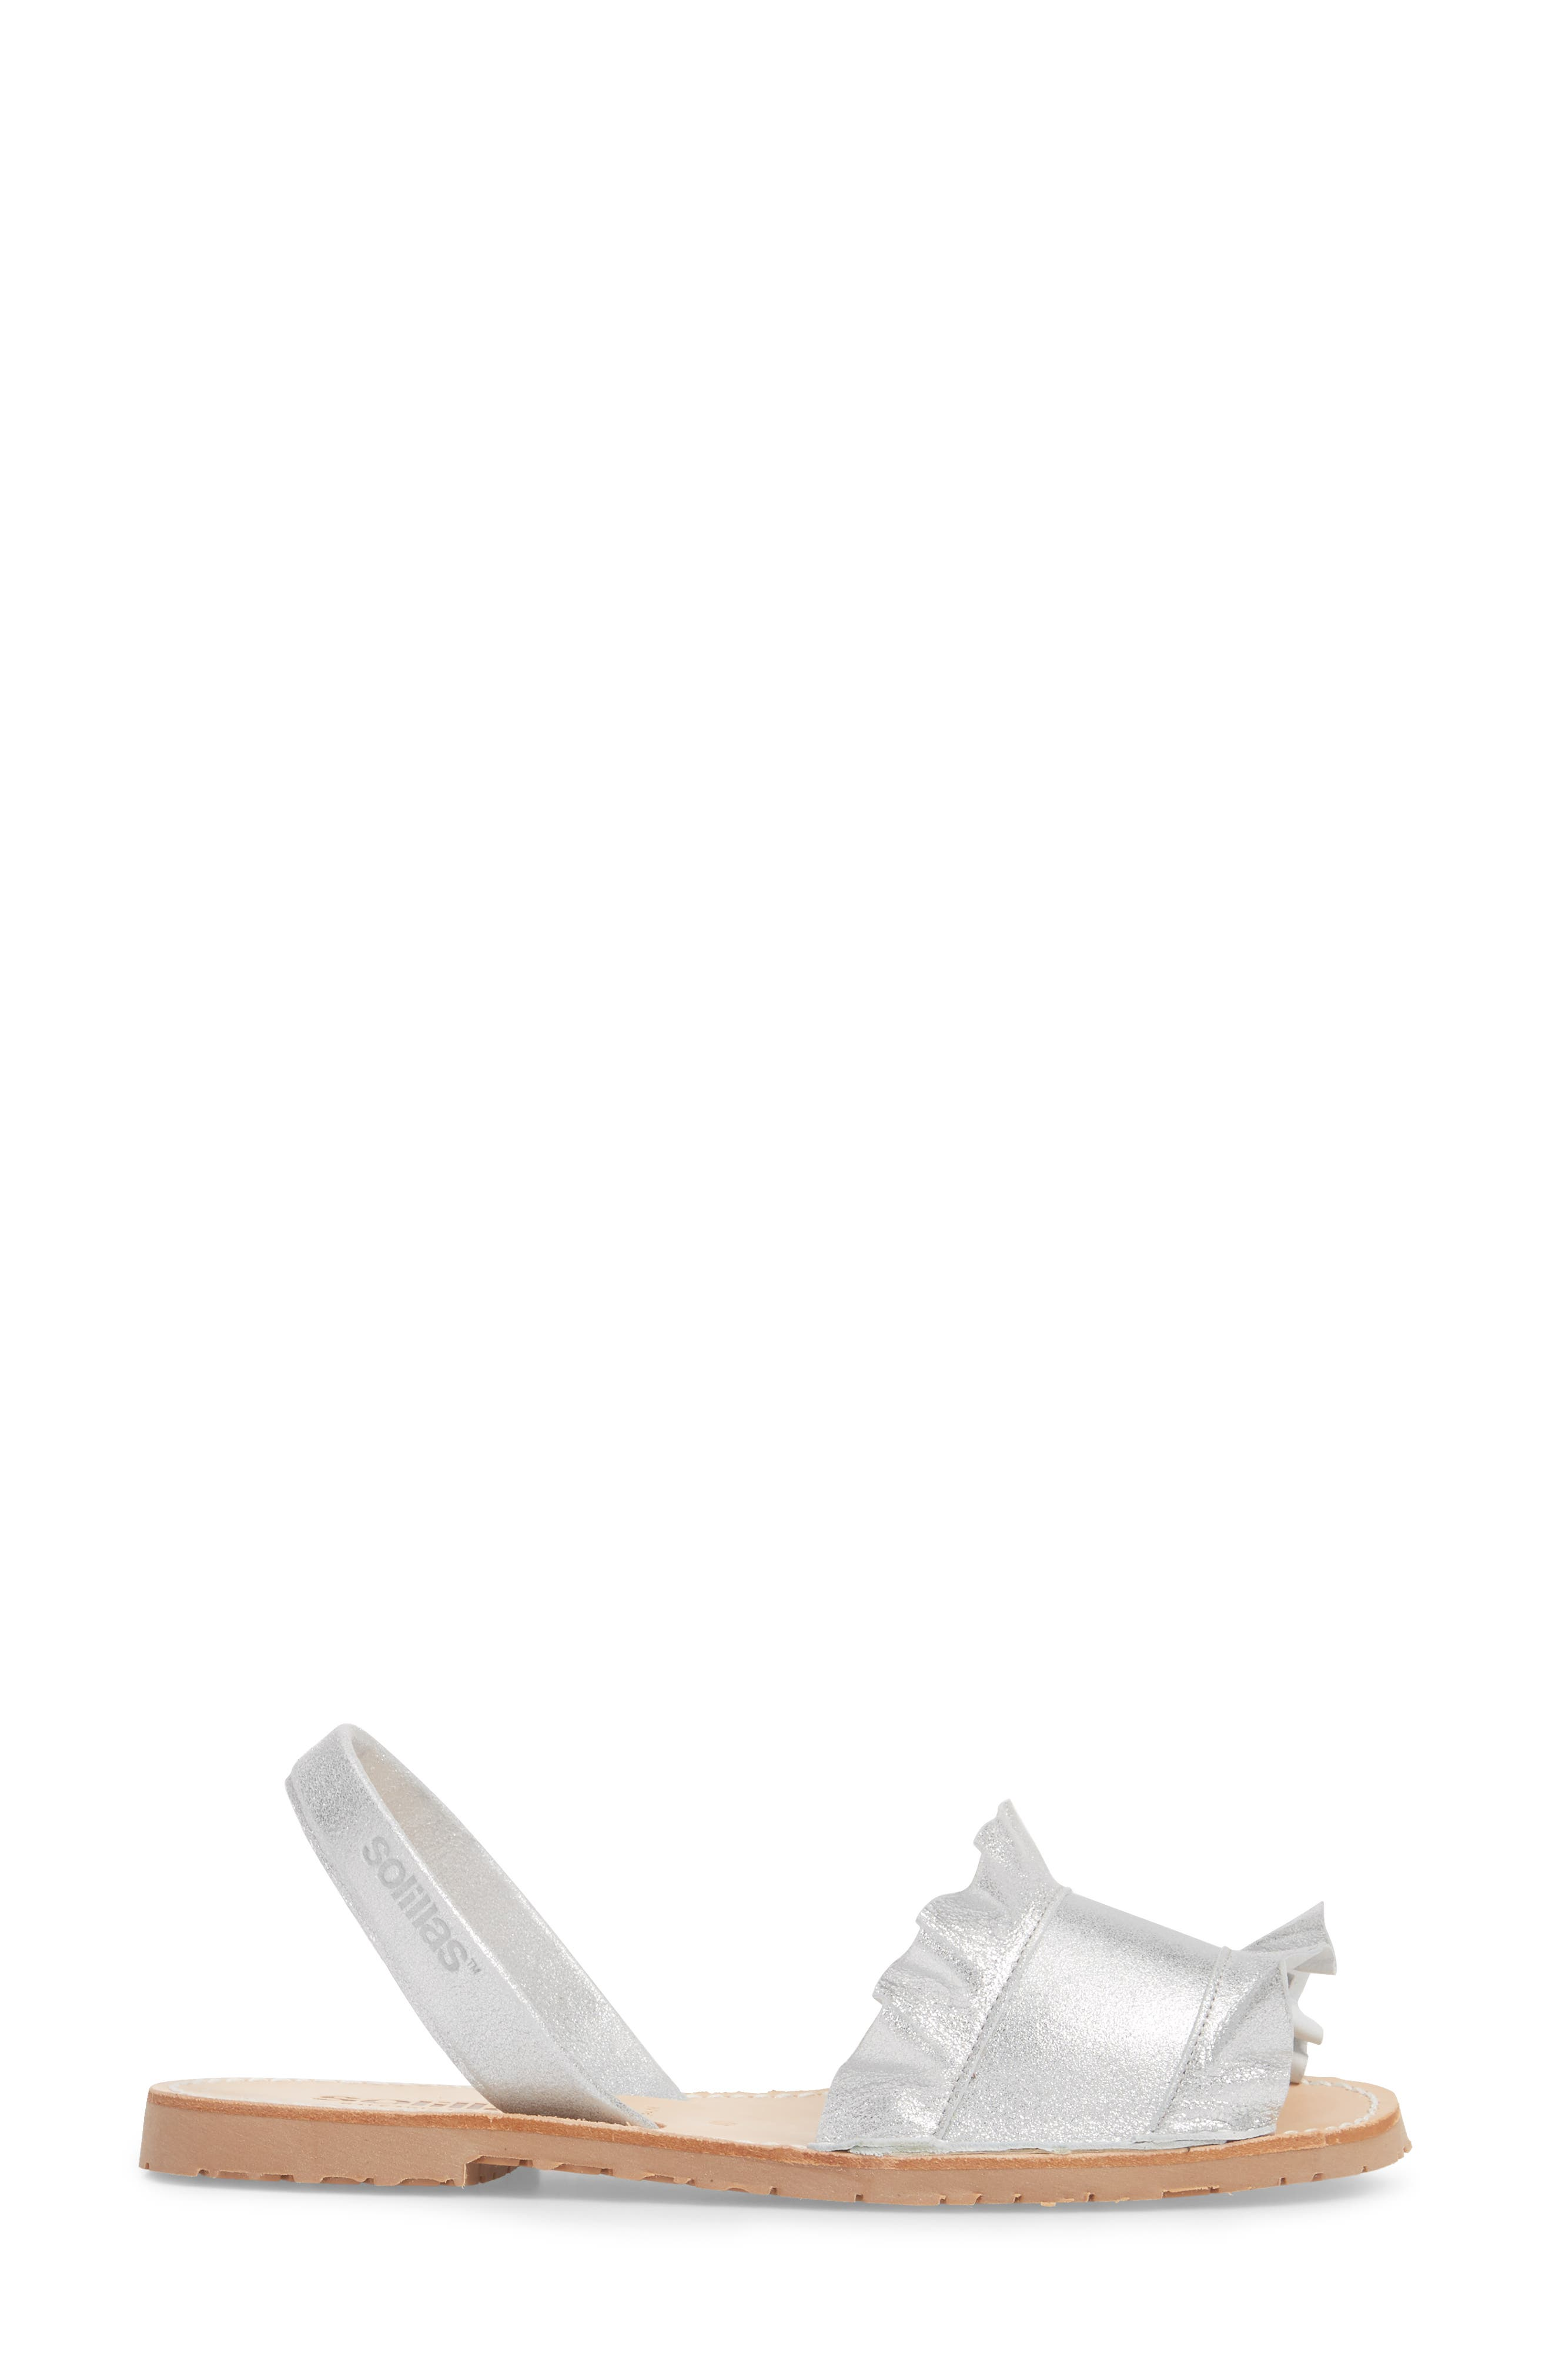 Frilled Flat Sandal,                             Alternate thumbnail 3, color,                             040